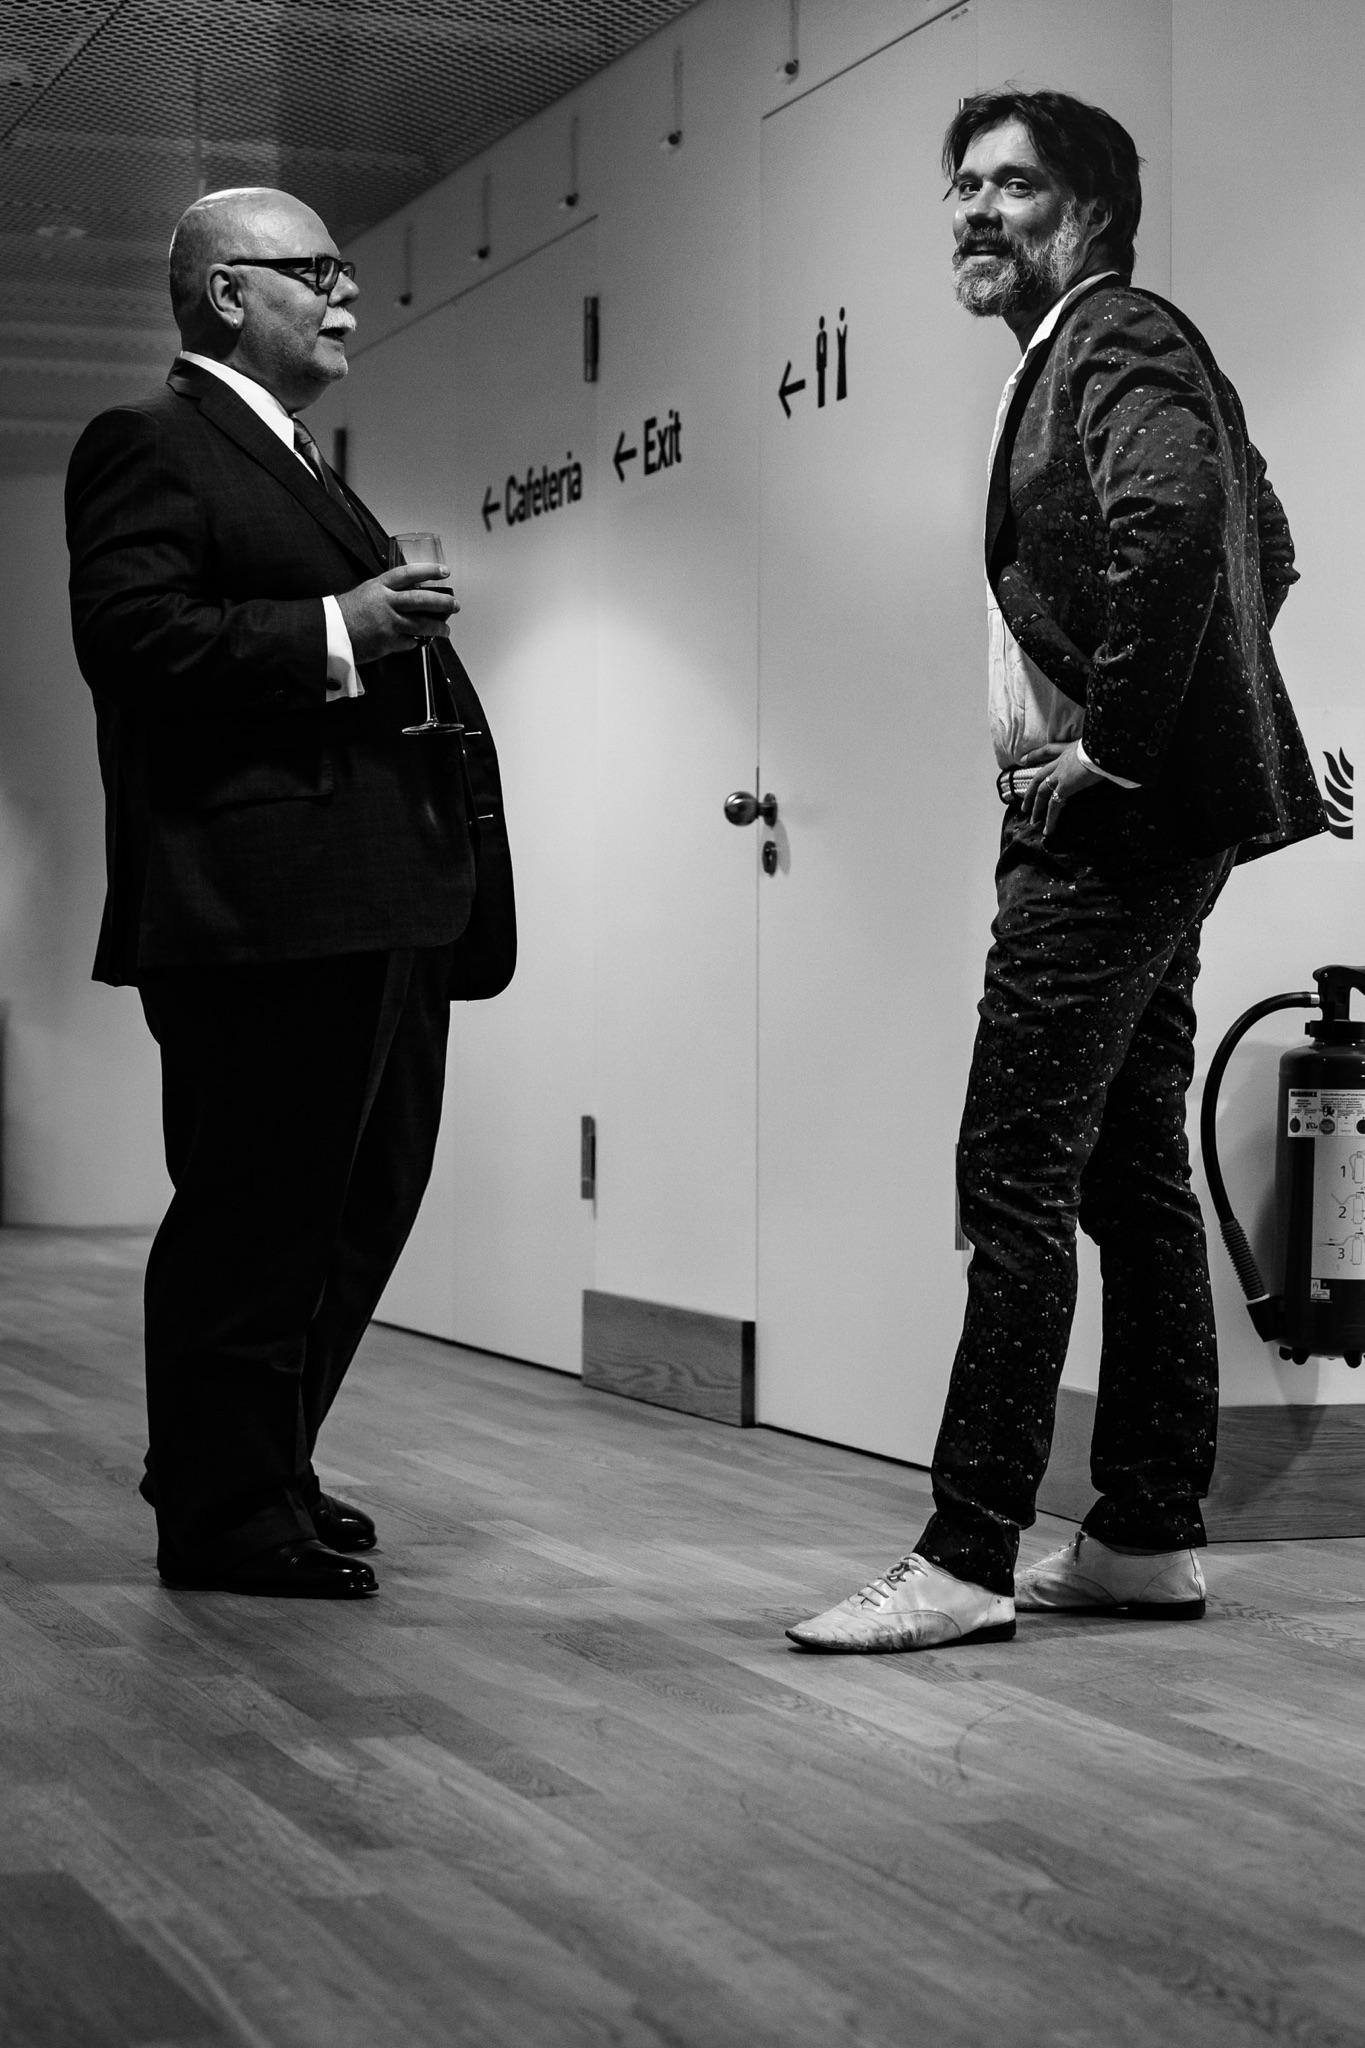 Mark Hummel and Rufus Wainwright post Hamburg concert at the Elbphilharmonie. Photo Credit: Peter Hundert